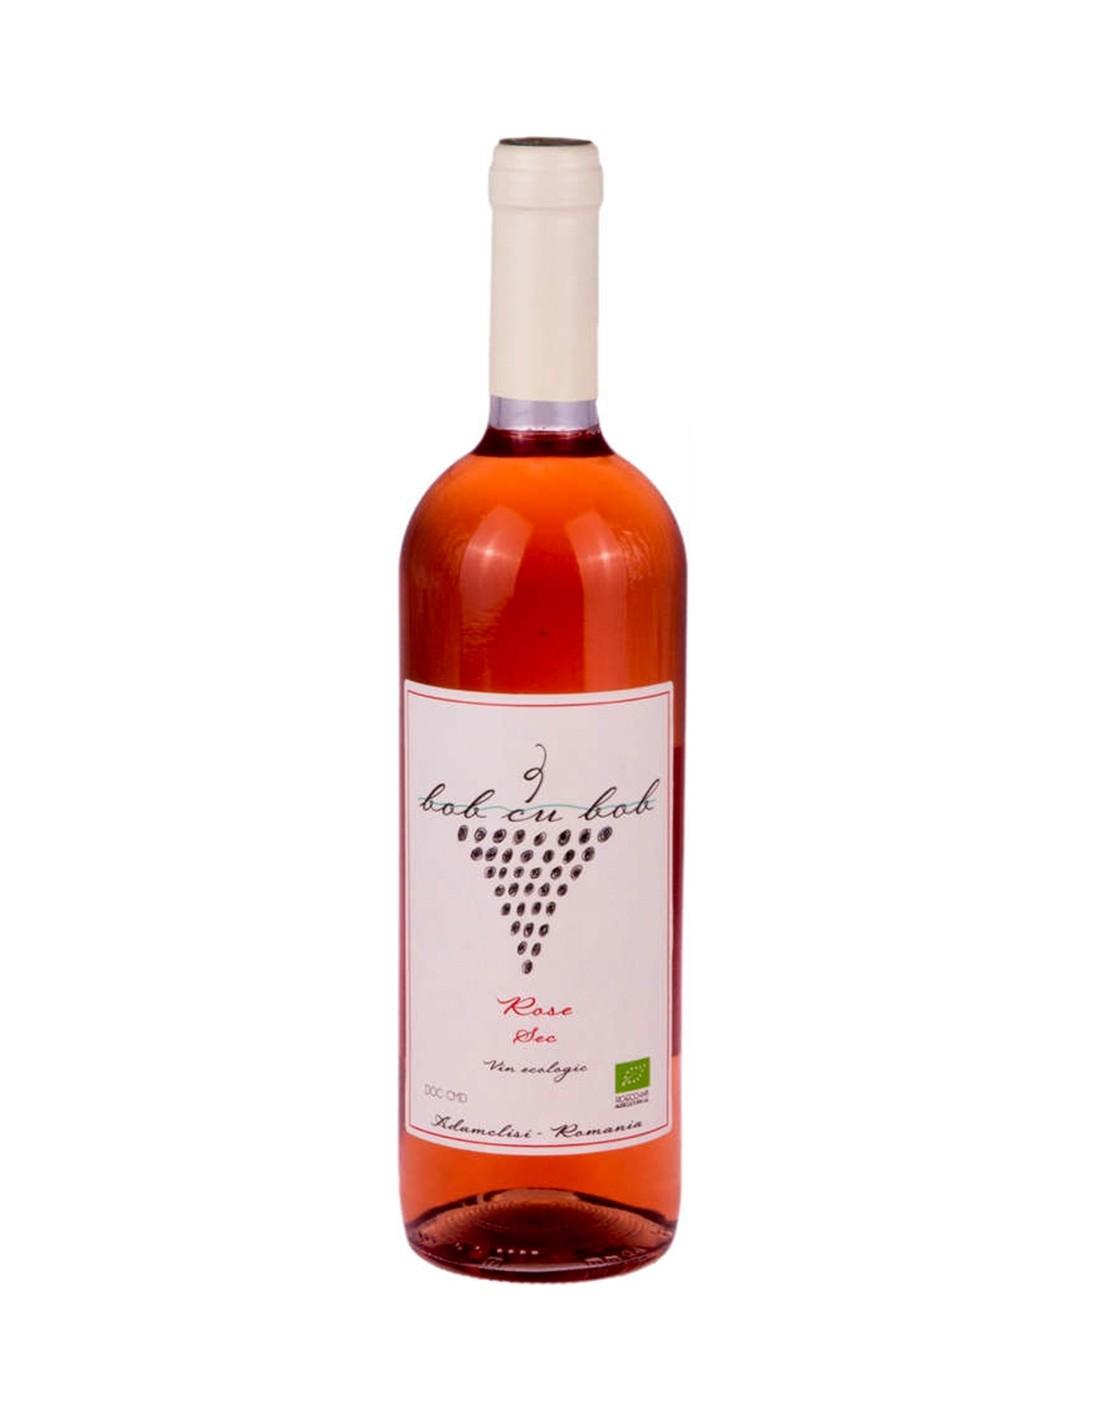 Vin roze sec, Pinot Noir, Bob cu Bob Adamclisi, 0.75L, 13% alc., Romania